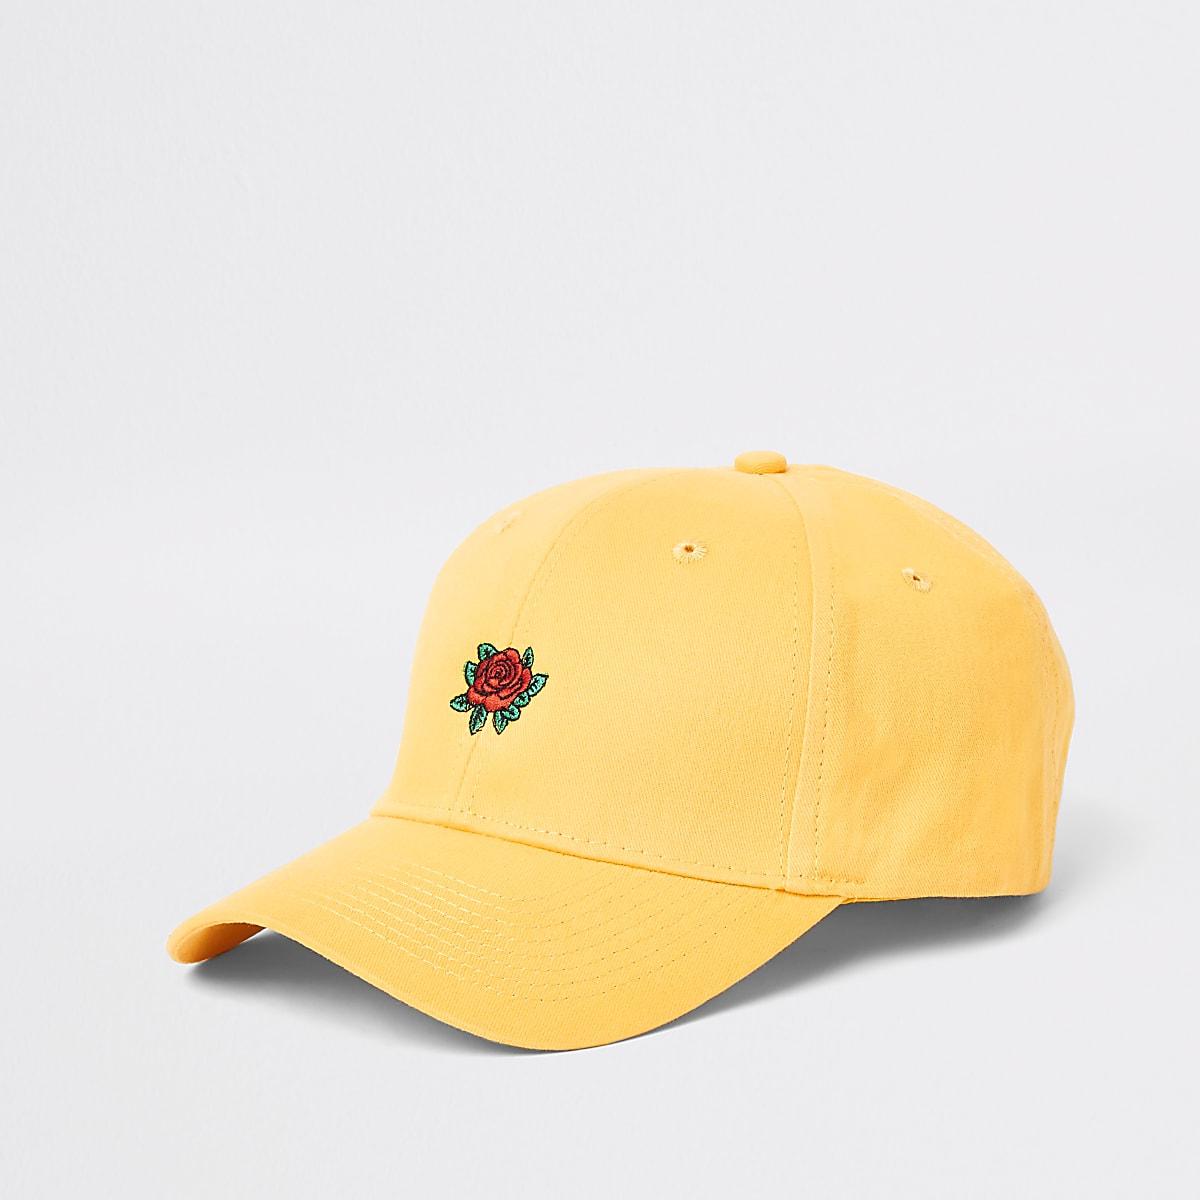 db2770e09e7 Yellow rose embroidered baseball cap - Hats   Caps - Accessories - men